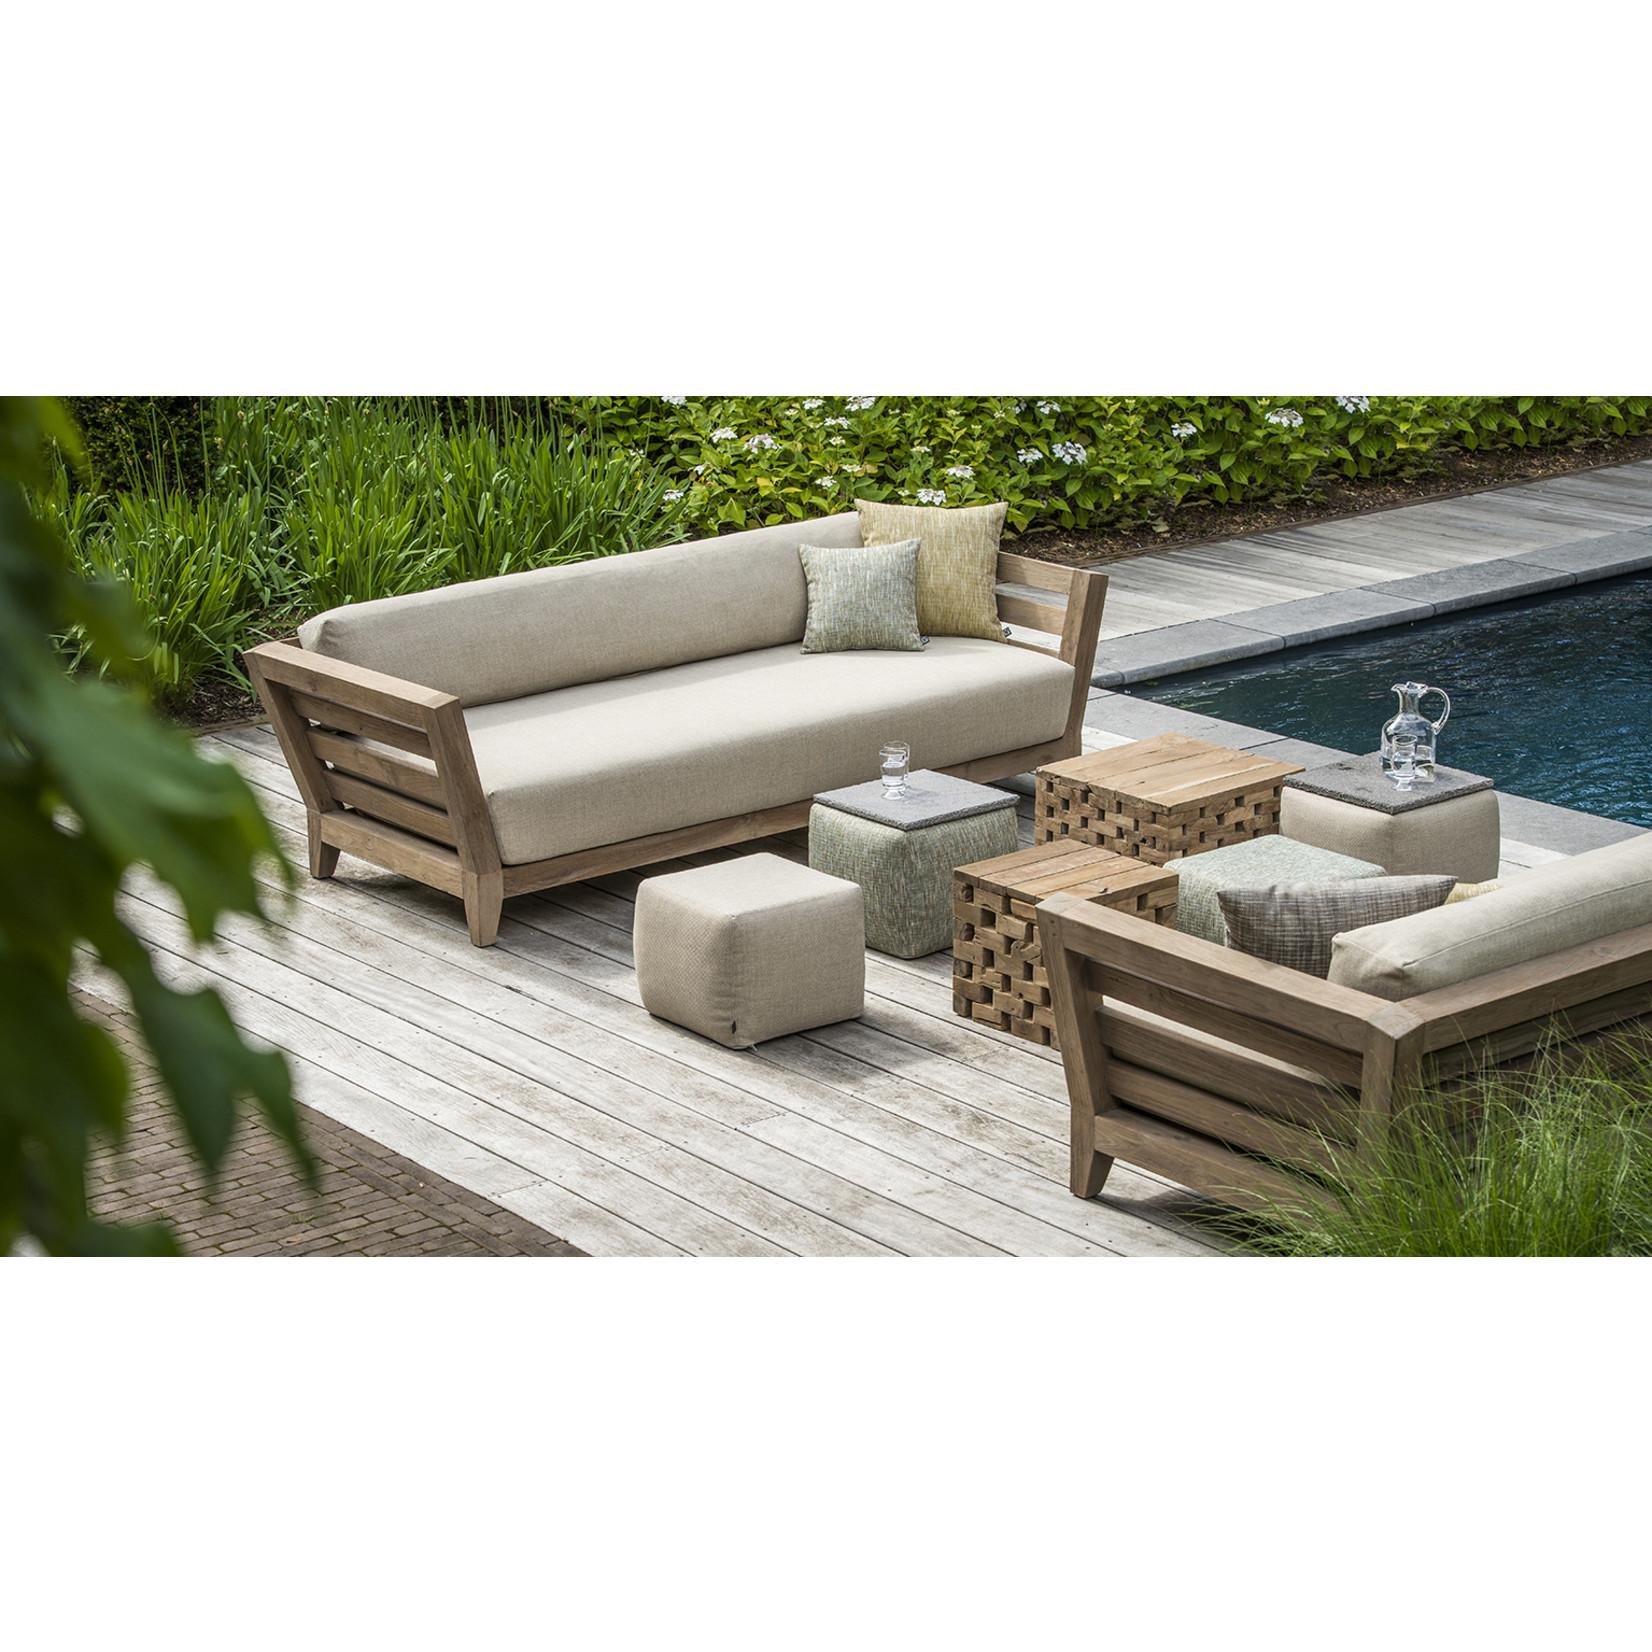 Gommaire Sofa Mia | Reclaimed Teak Natural Grey + Cushion